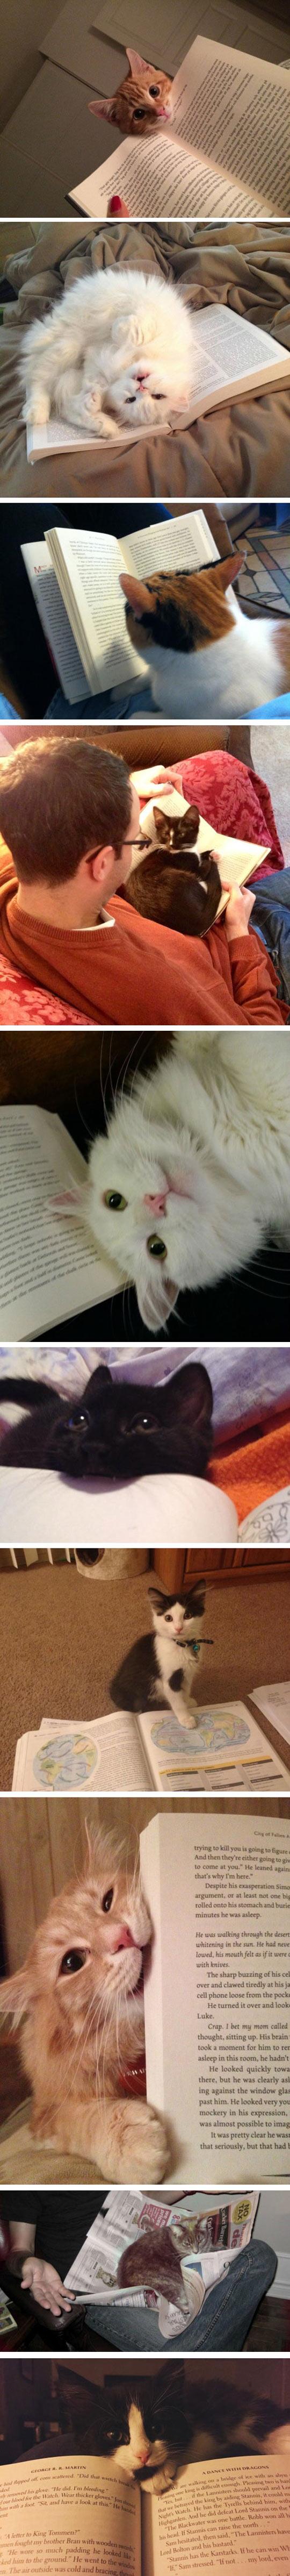 Cats Who Won